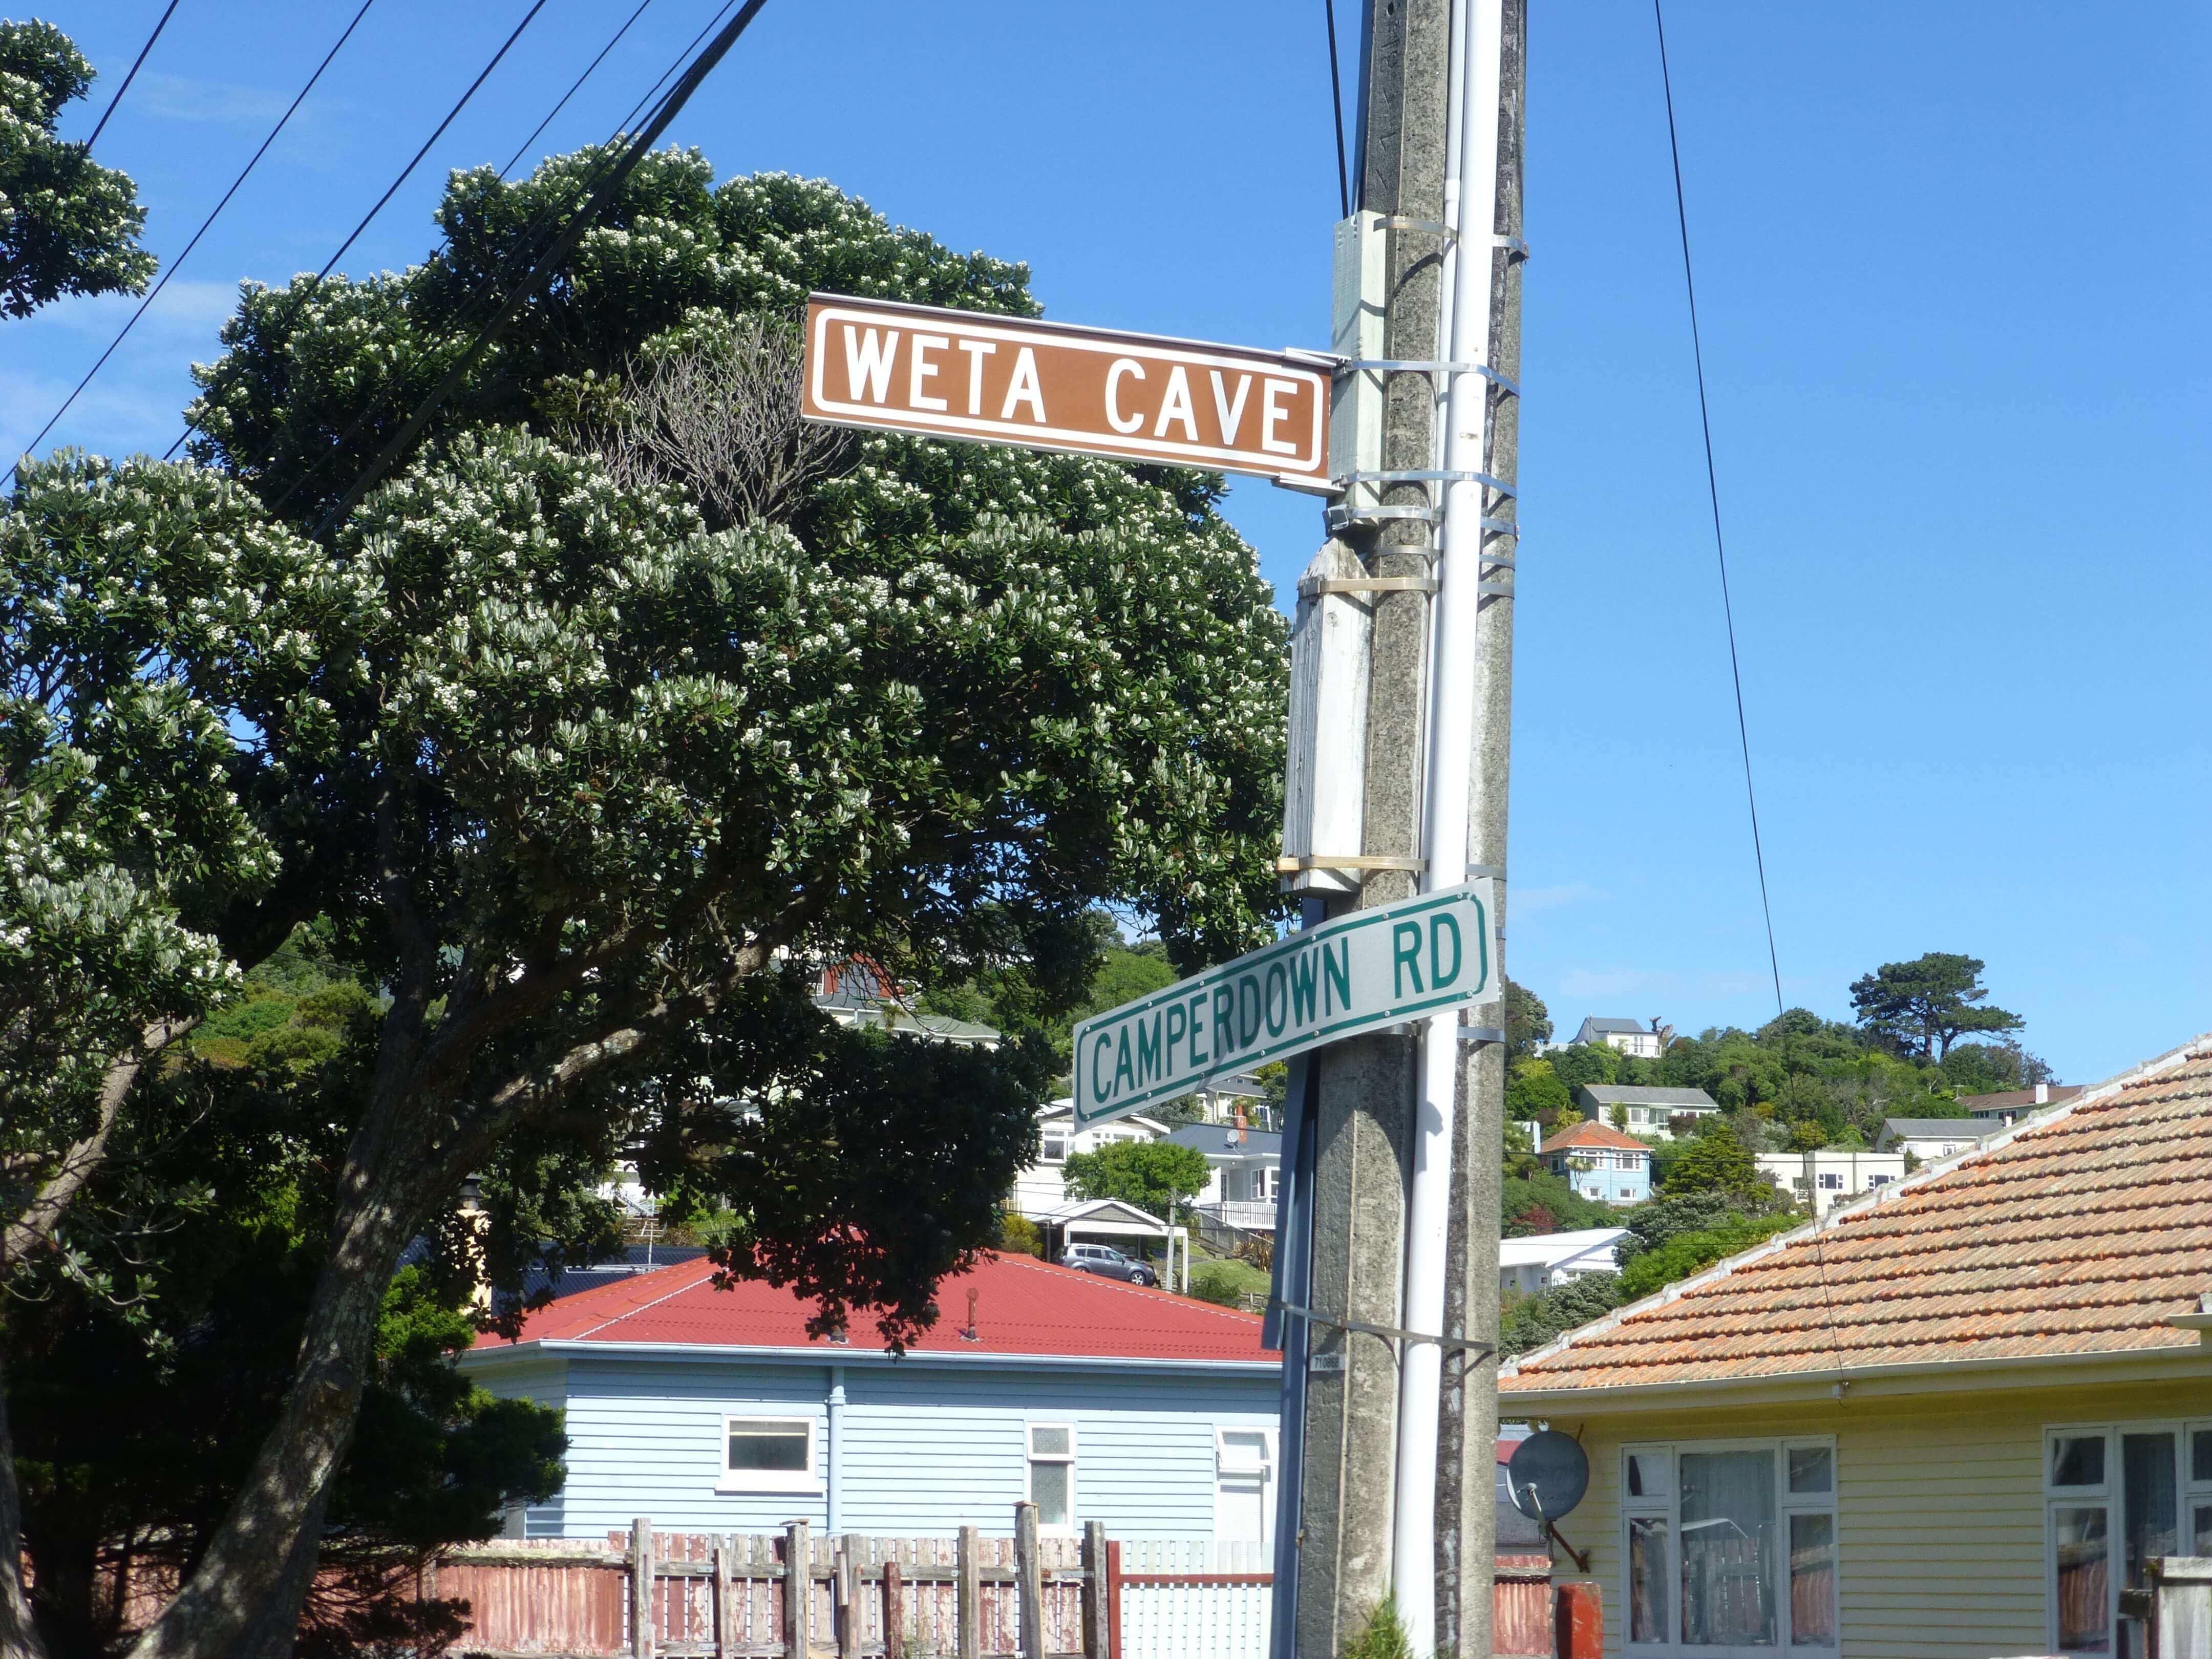 Wellington, in Miramar auf dem Weg zum Weta Shop, Weit-weg.reisen, 7